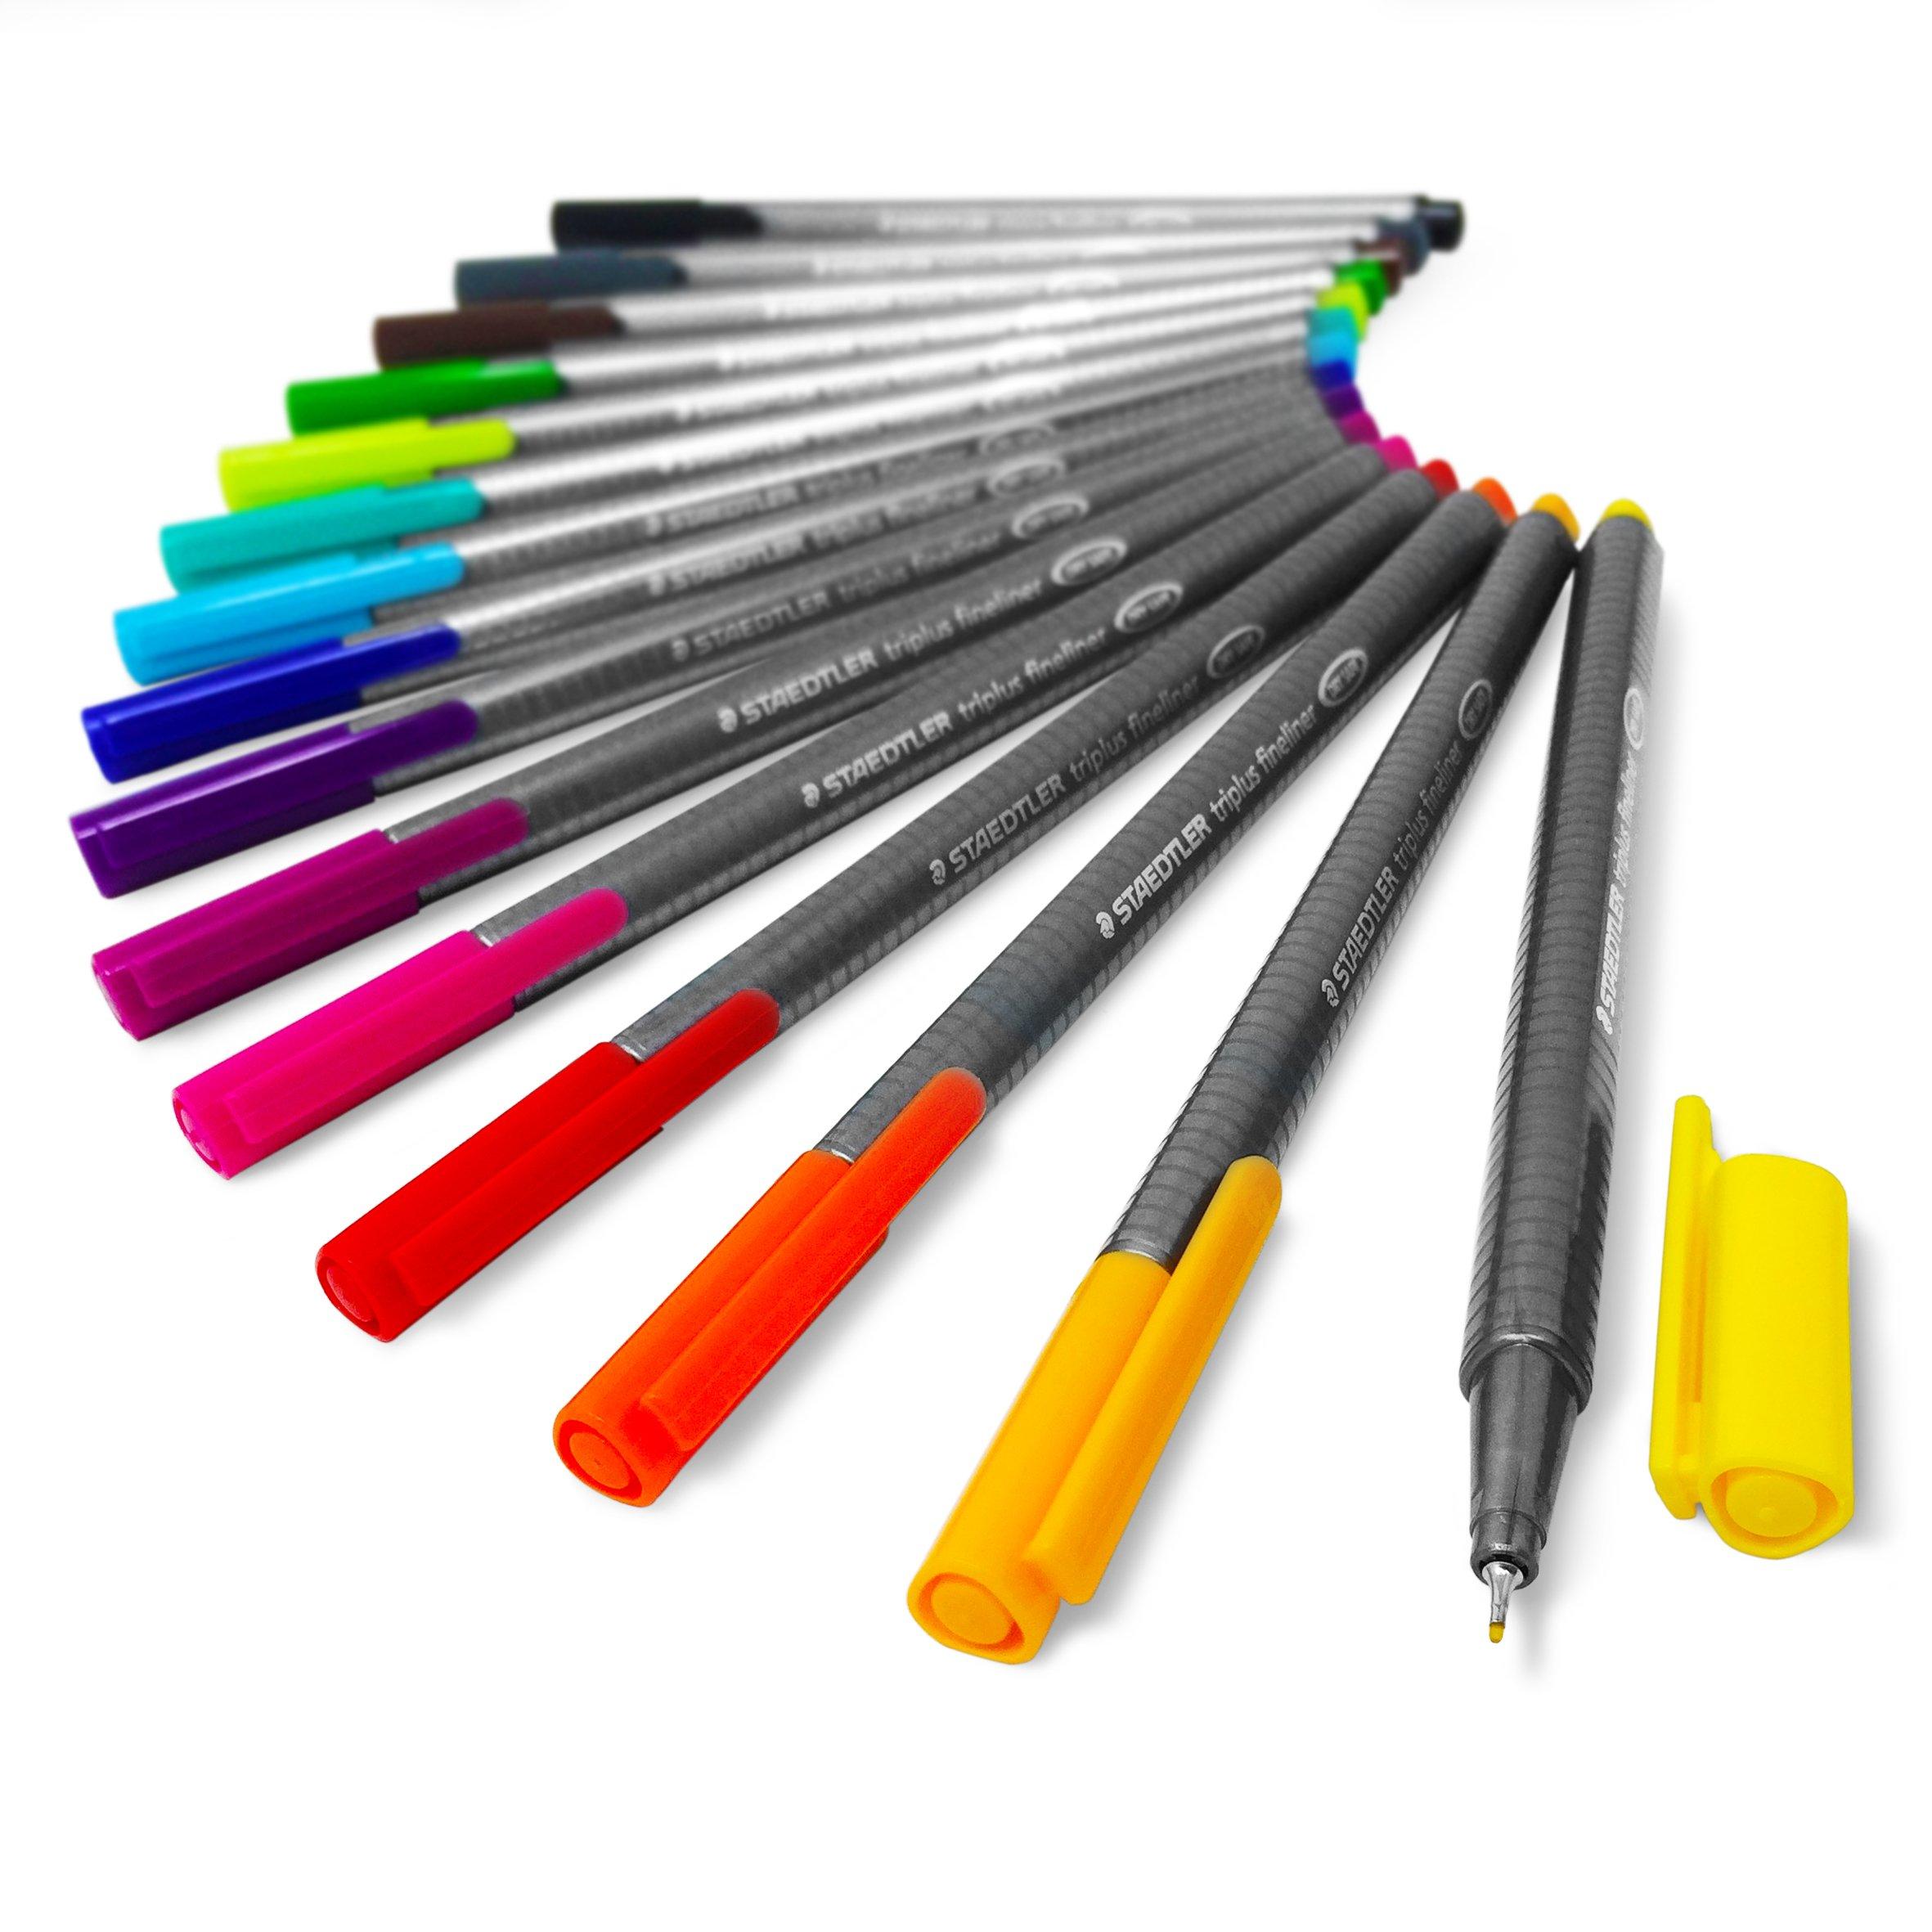 Staedtler Triplus Fineliner Pens - Metal Gift Tin of 15 Brilliant Colours - 0.3mm by STAEDTLER